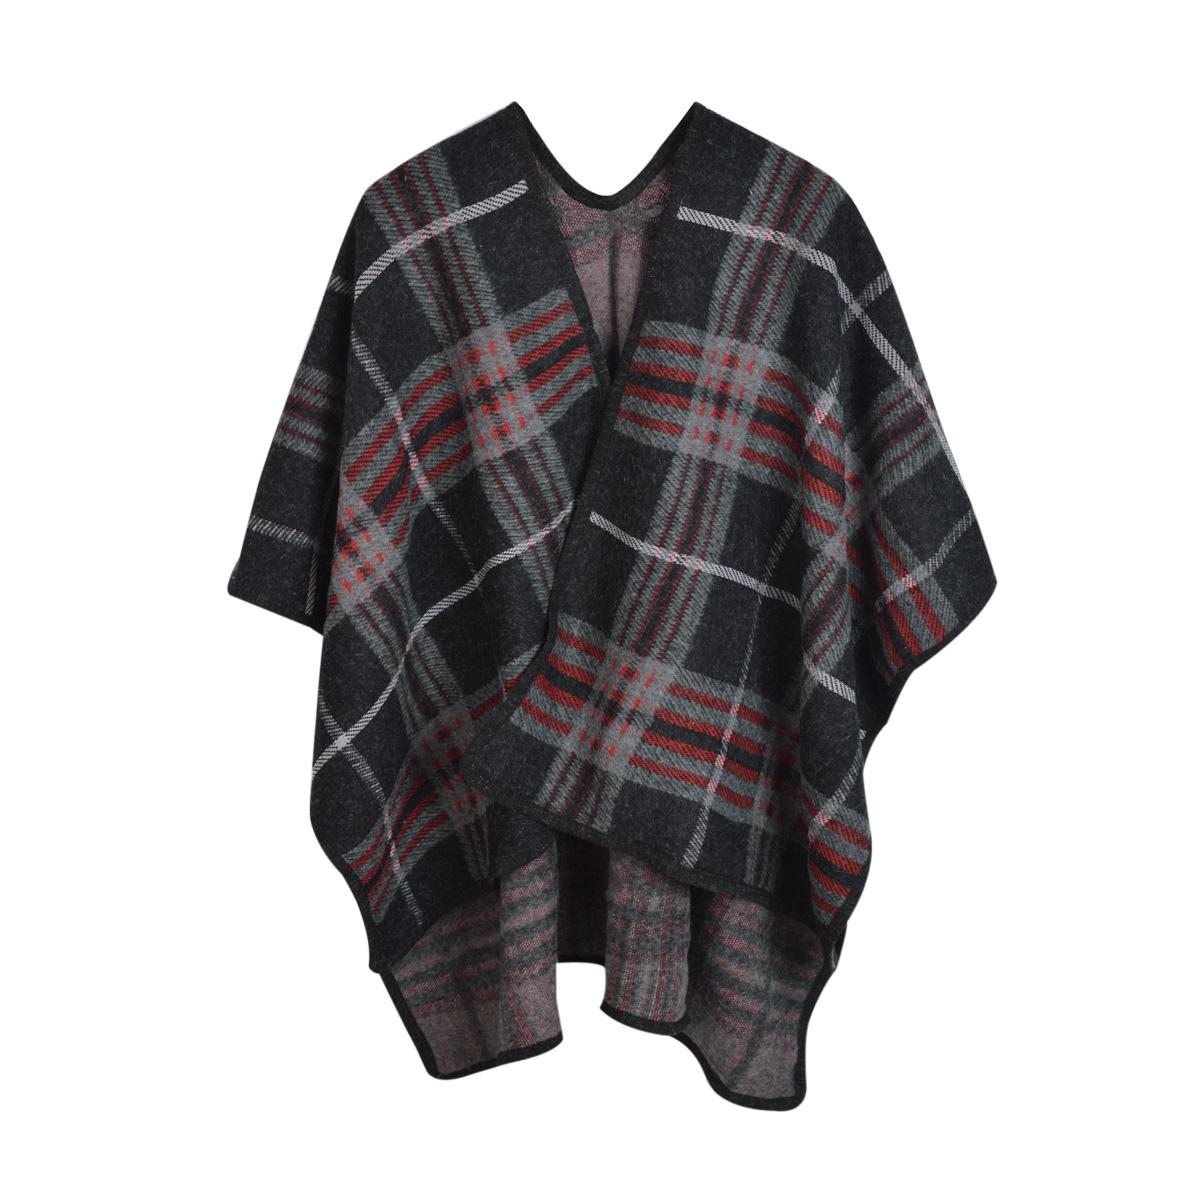 Premium Warm Winter Check Plaid Blanket Poncho Shawl Cape Wrap by TrendsBlue